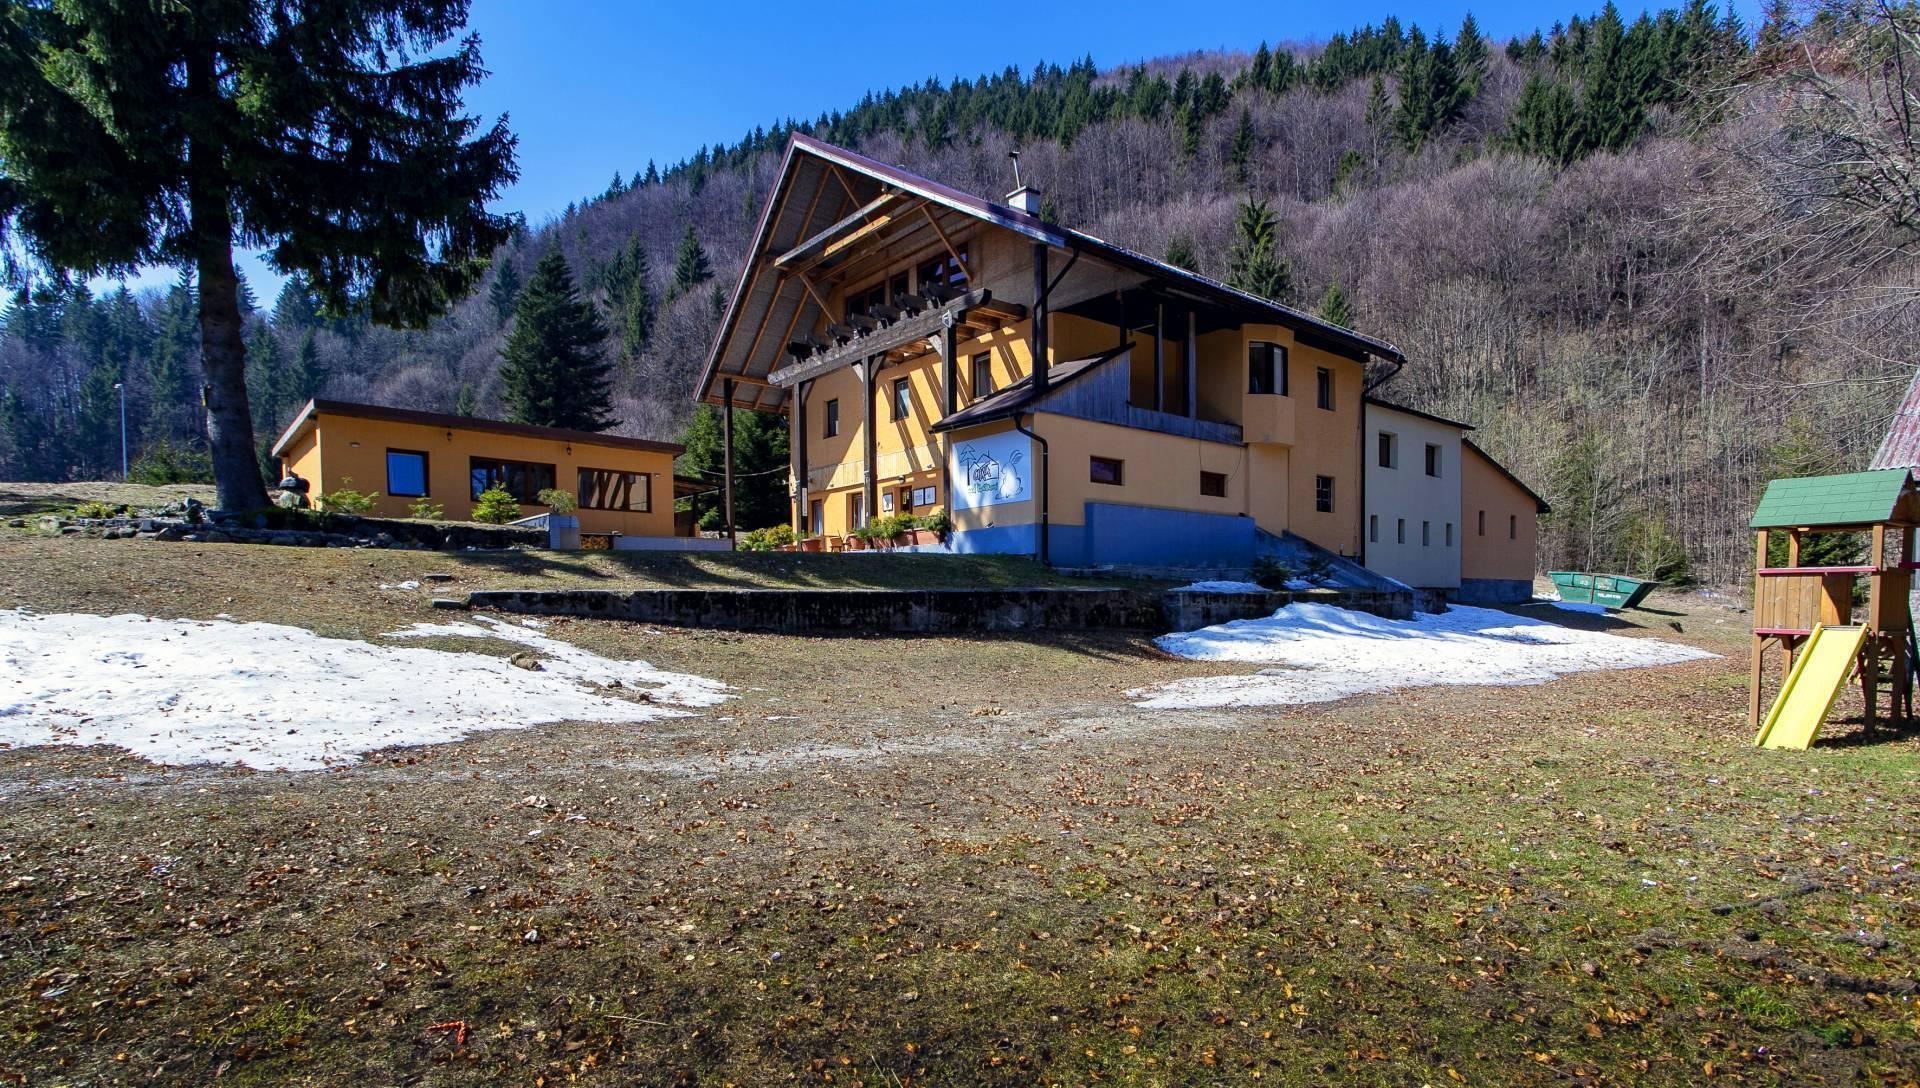 PRENÁJOM: Unikátna horská chata600m2_obec Králiky_okres Banská Bystrica